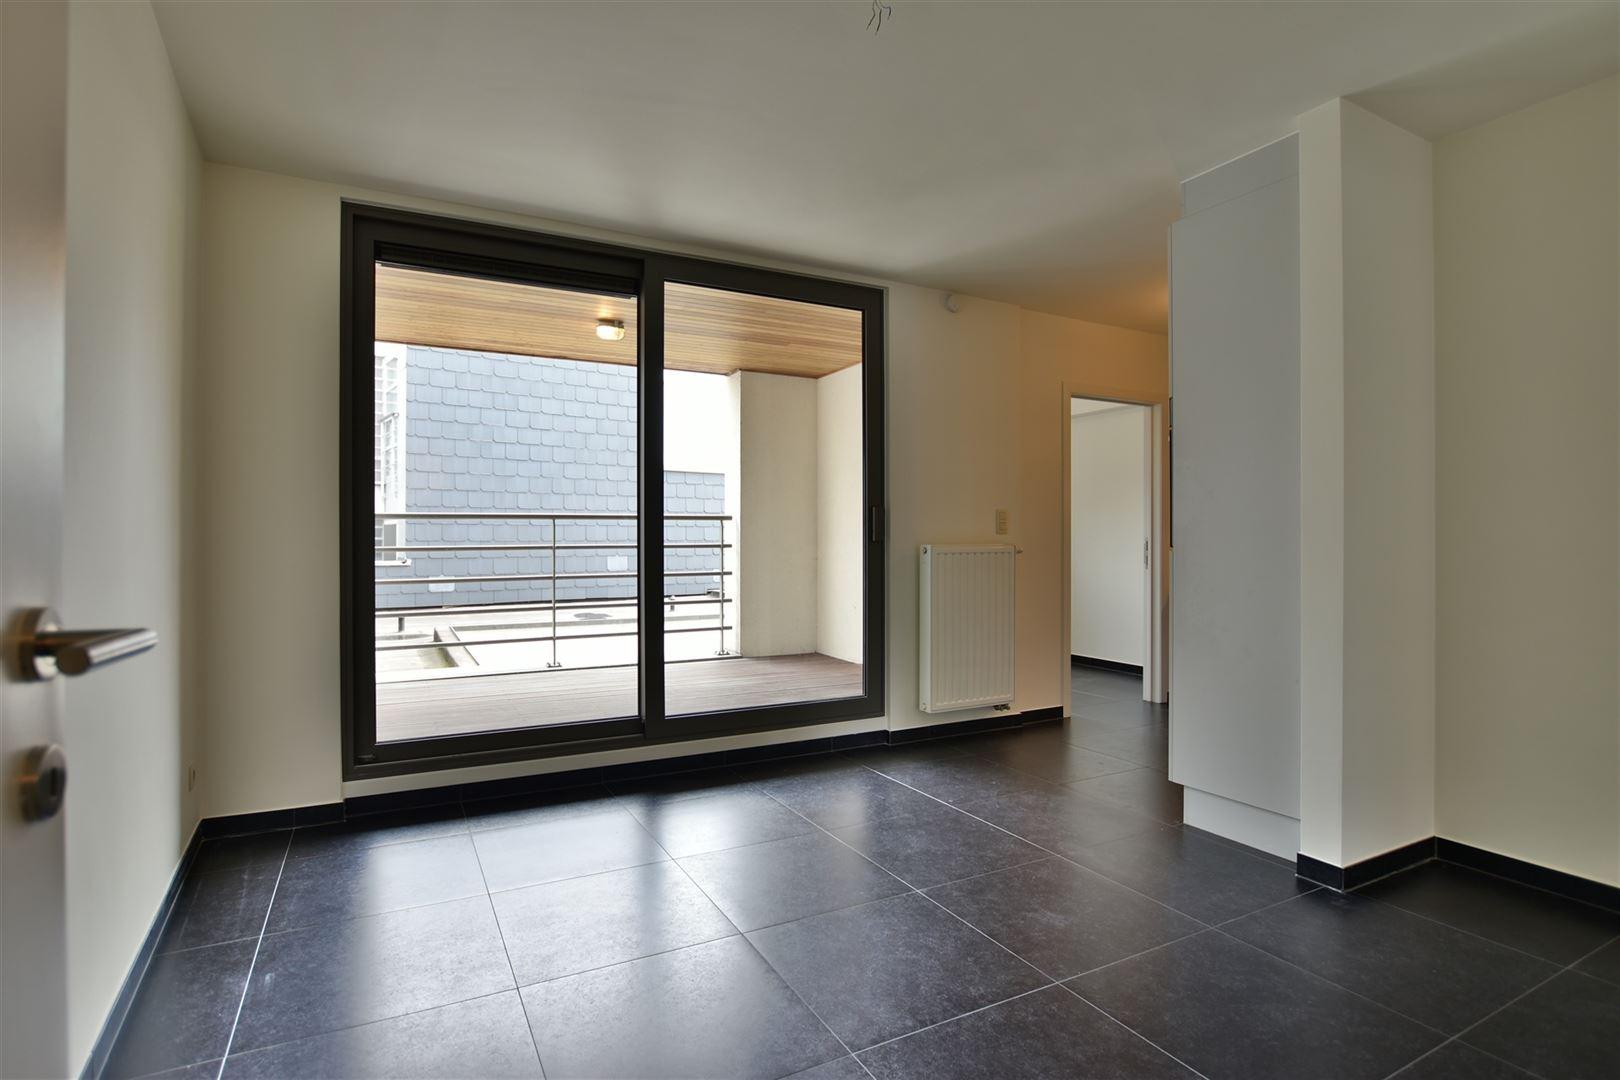 Foto 8 : Duplex/Penthouse te 9200 Sint-Gillis-bij-Dendermonde (België) - Prijs € 278.000